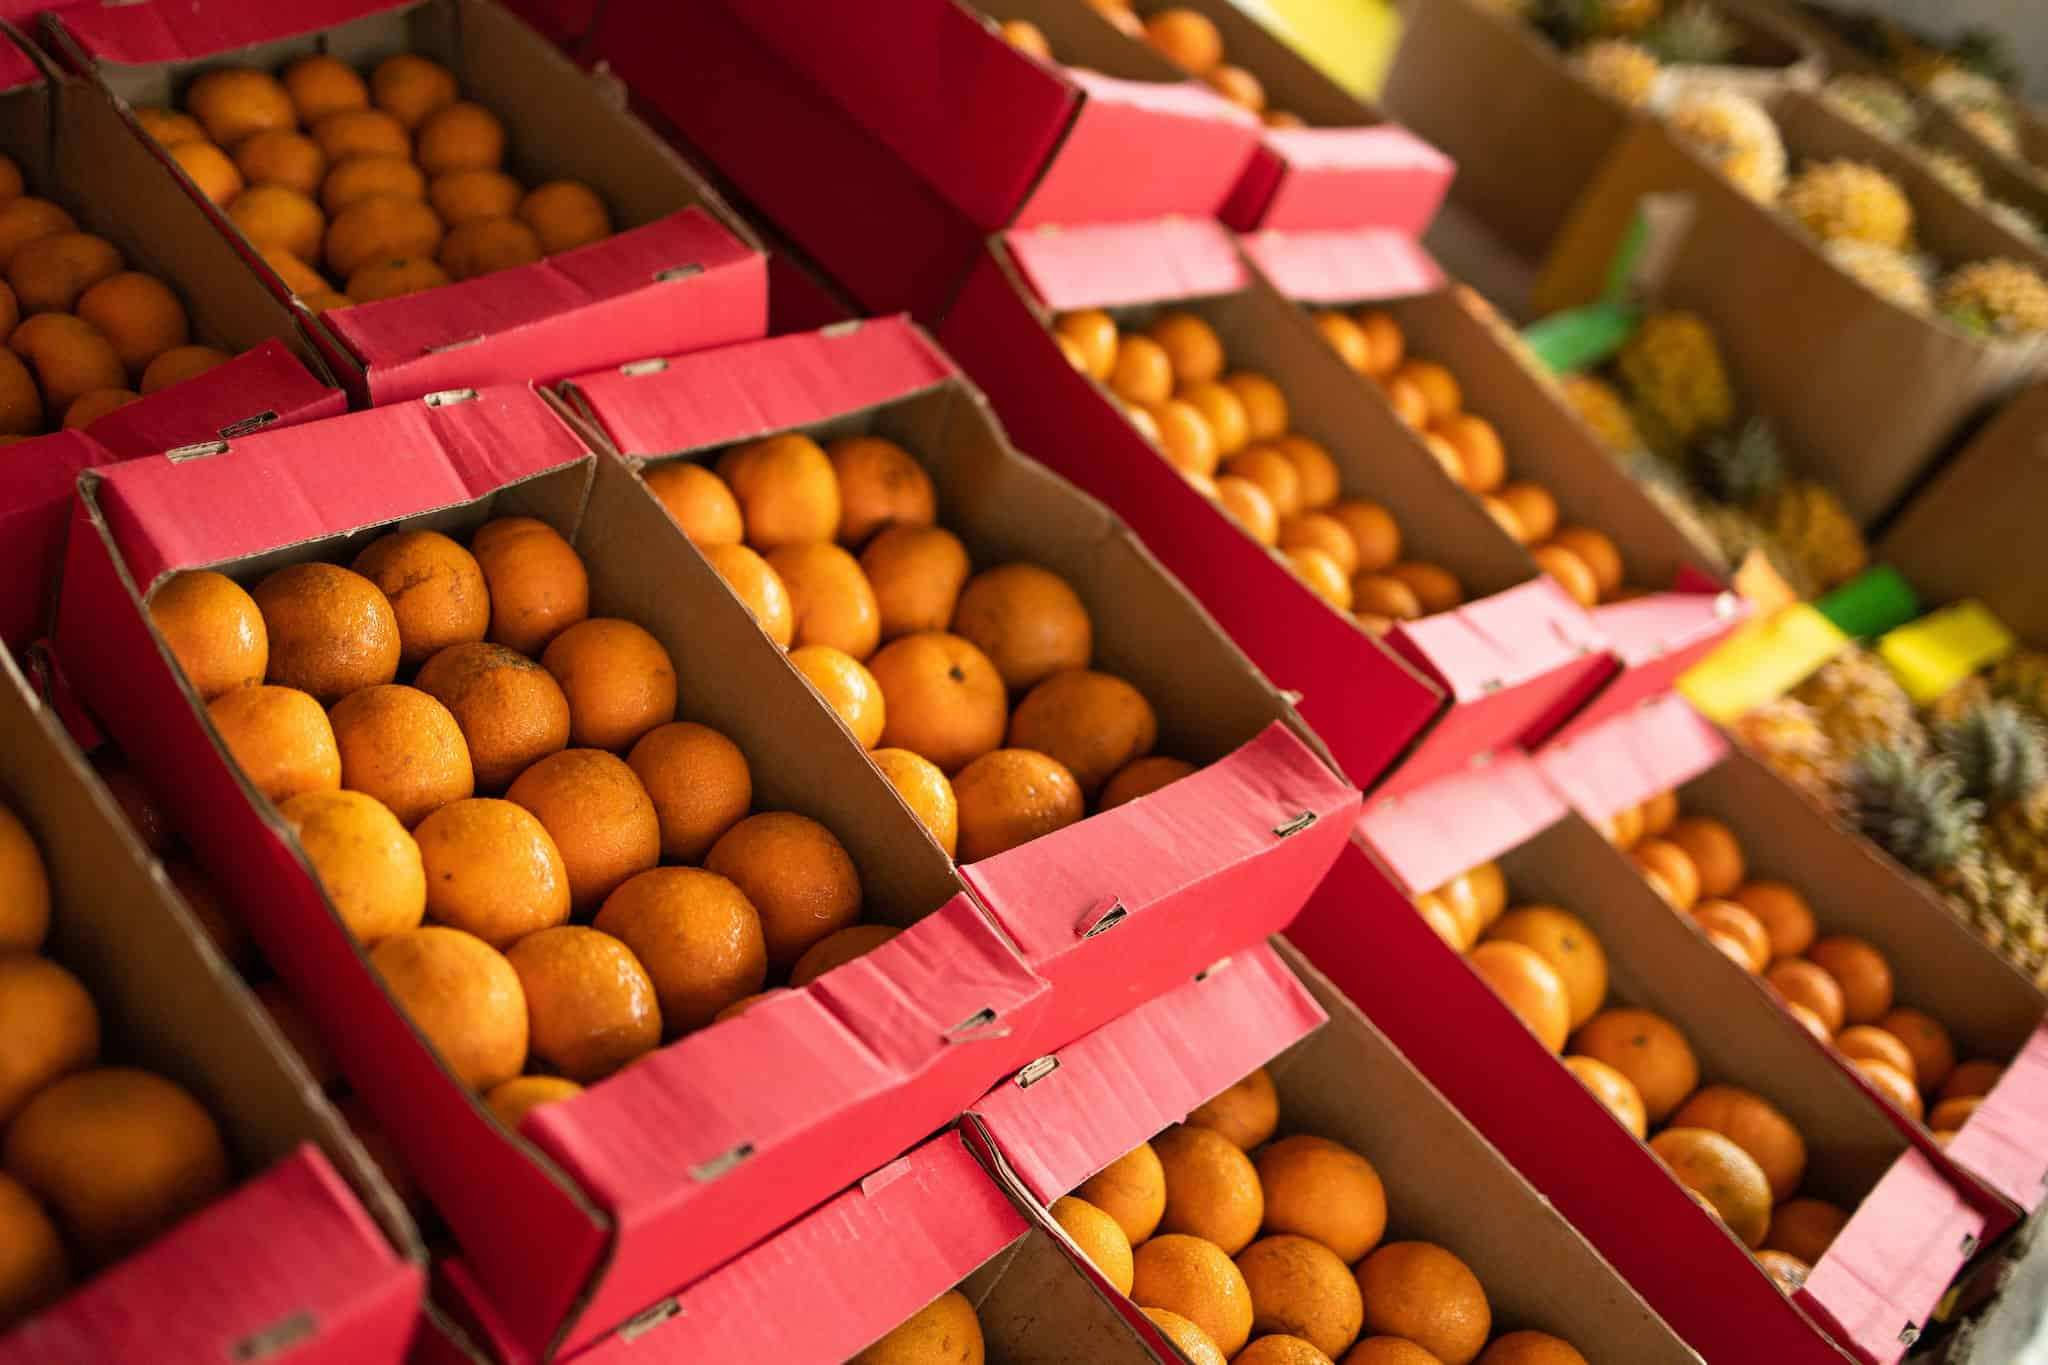 Nanaga fresh fruit boxes